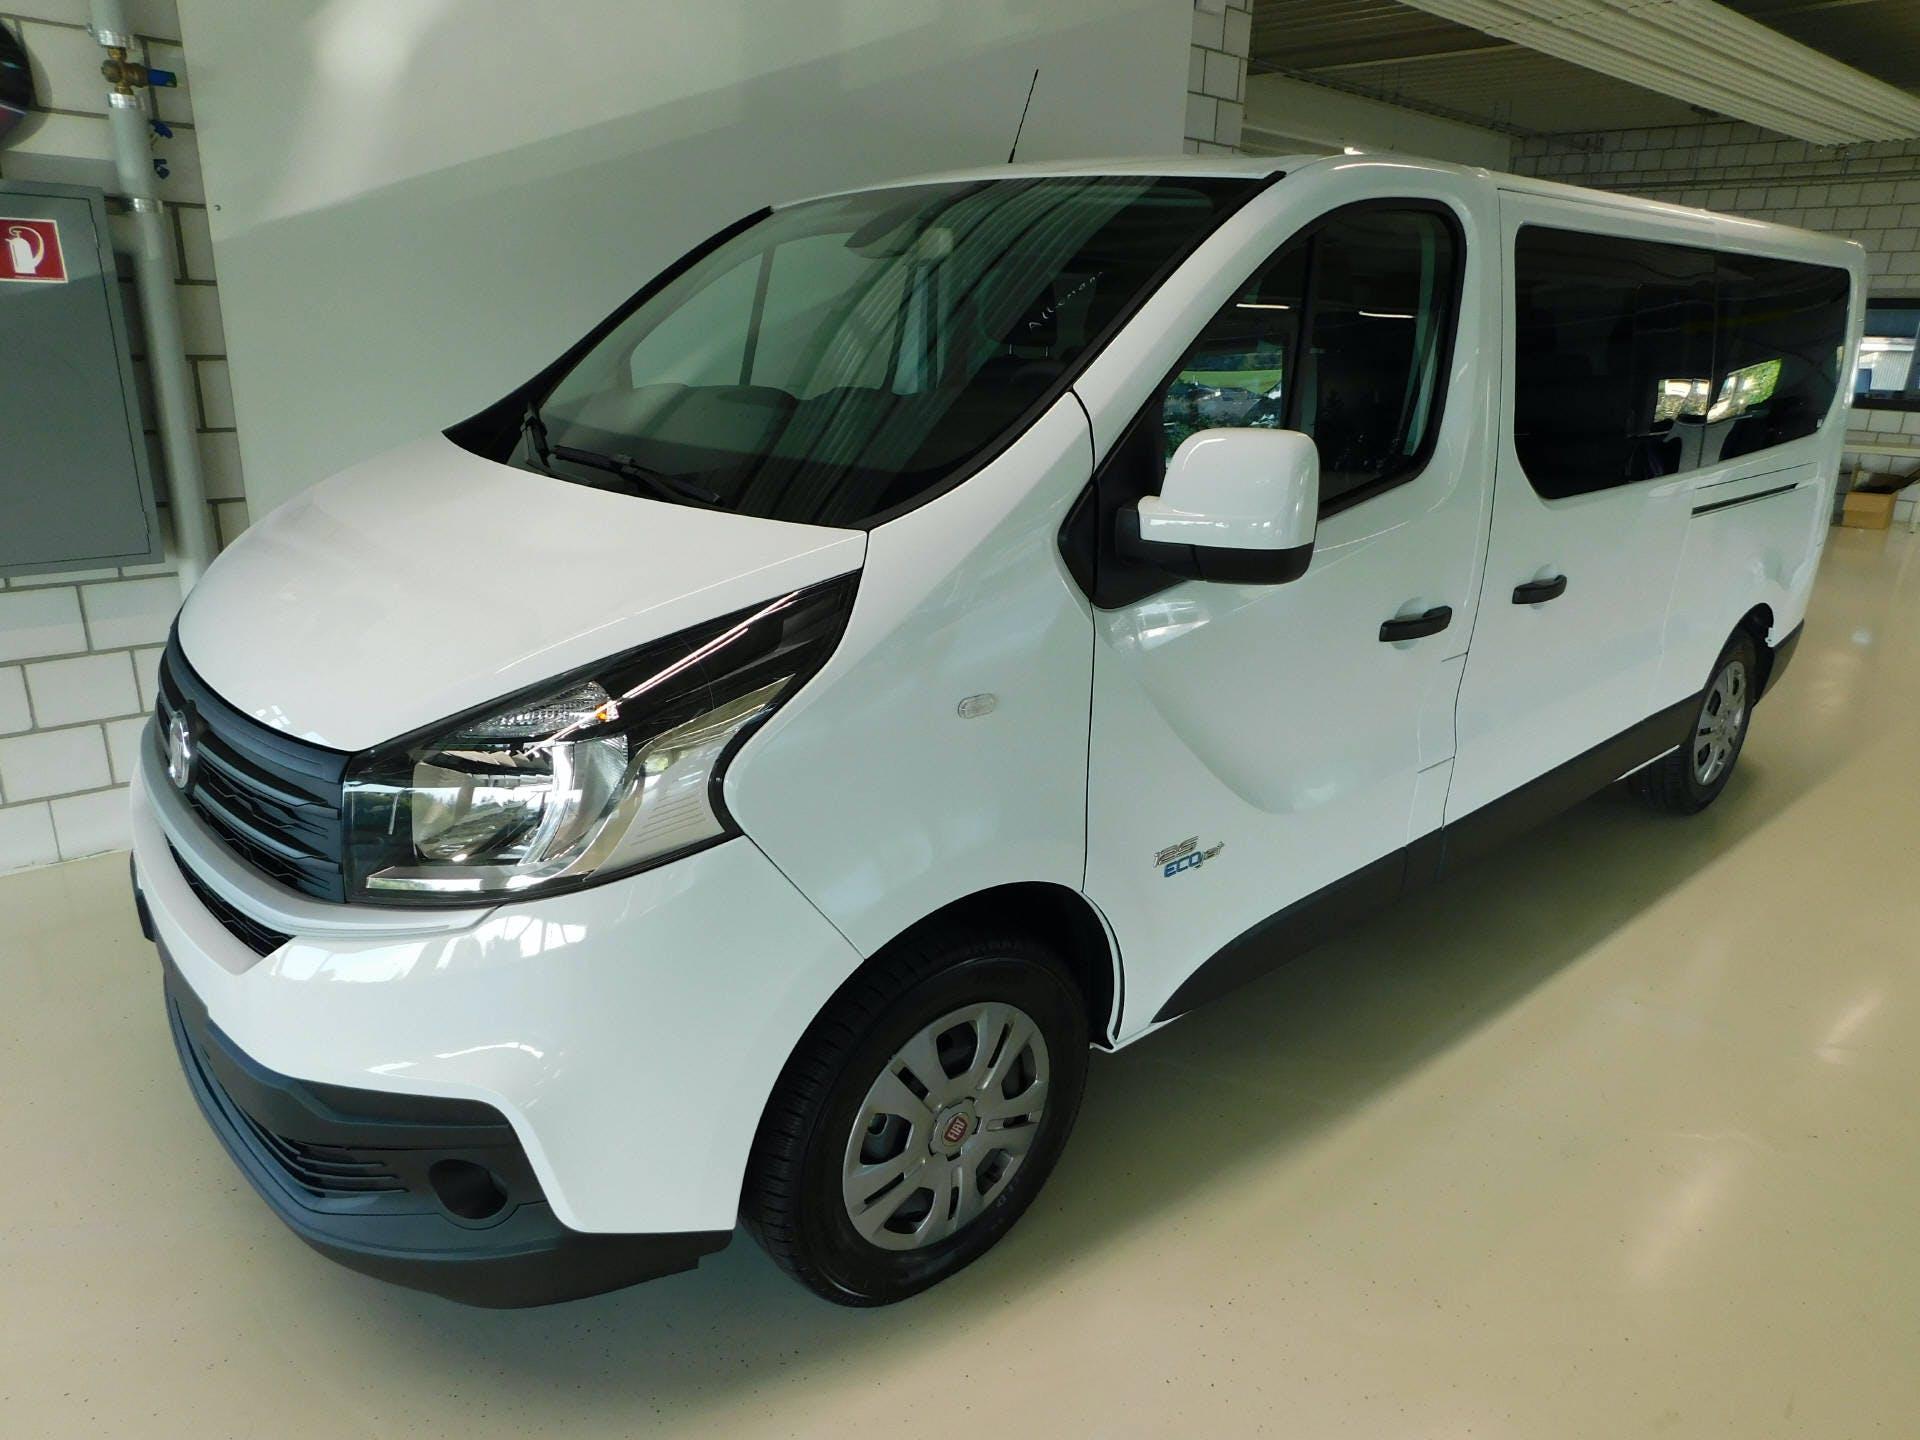 bus Fiat Talento 29 Ko.3498 H1v.1.6 EJ 120 Sw